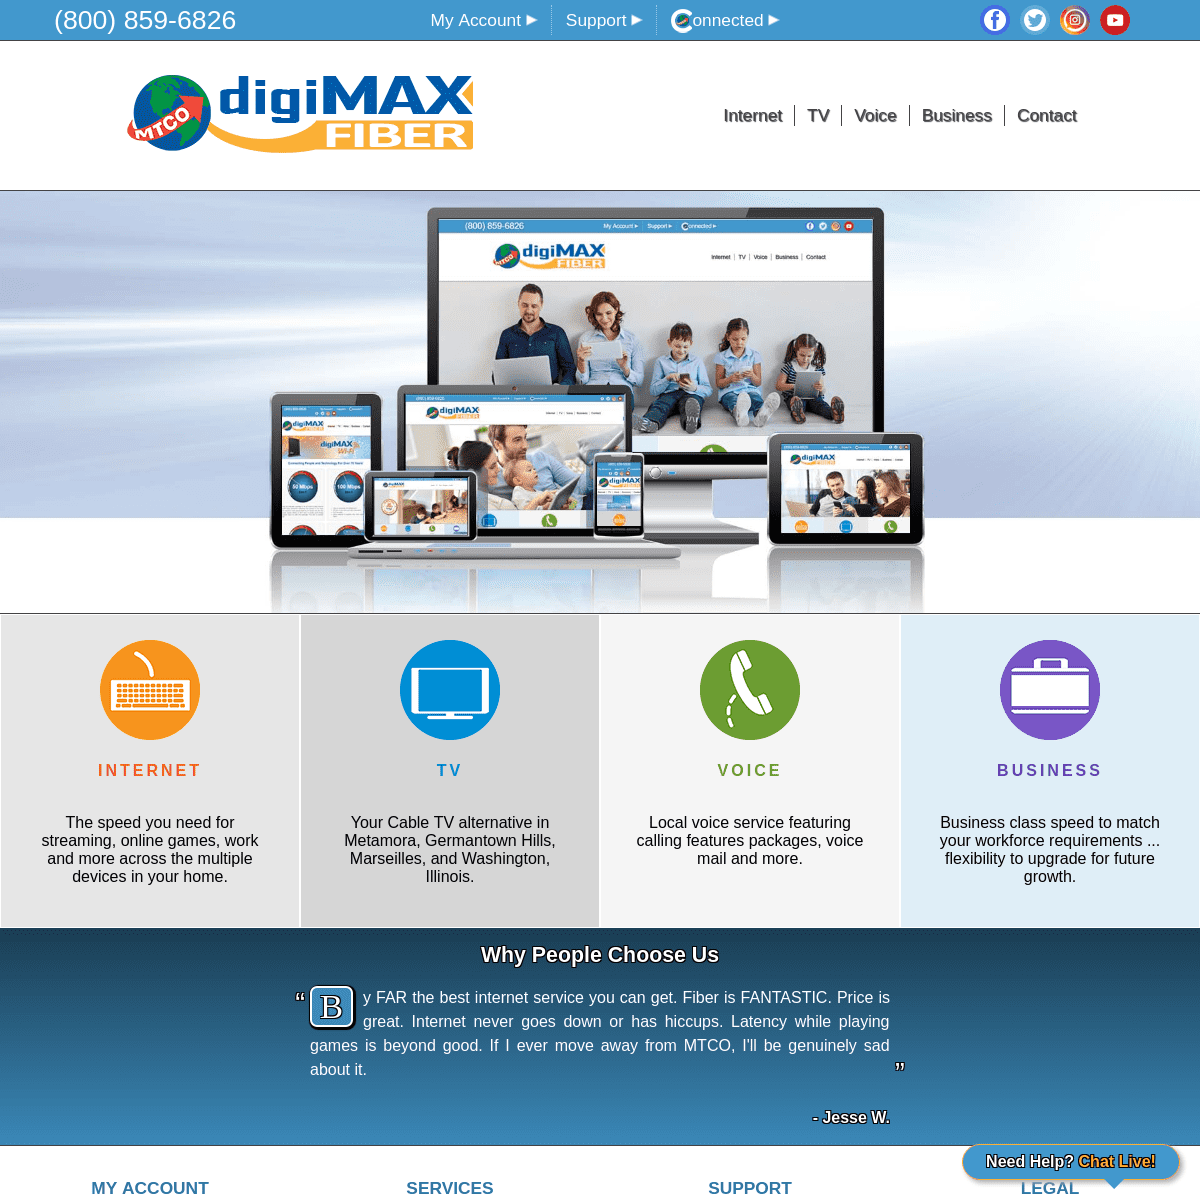 MTCO digiMAX Internet, TV, Voice